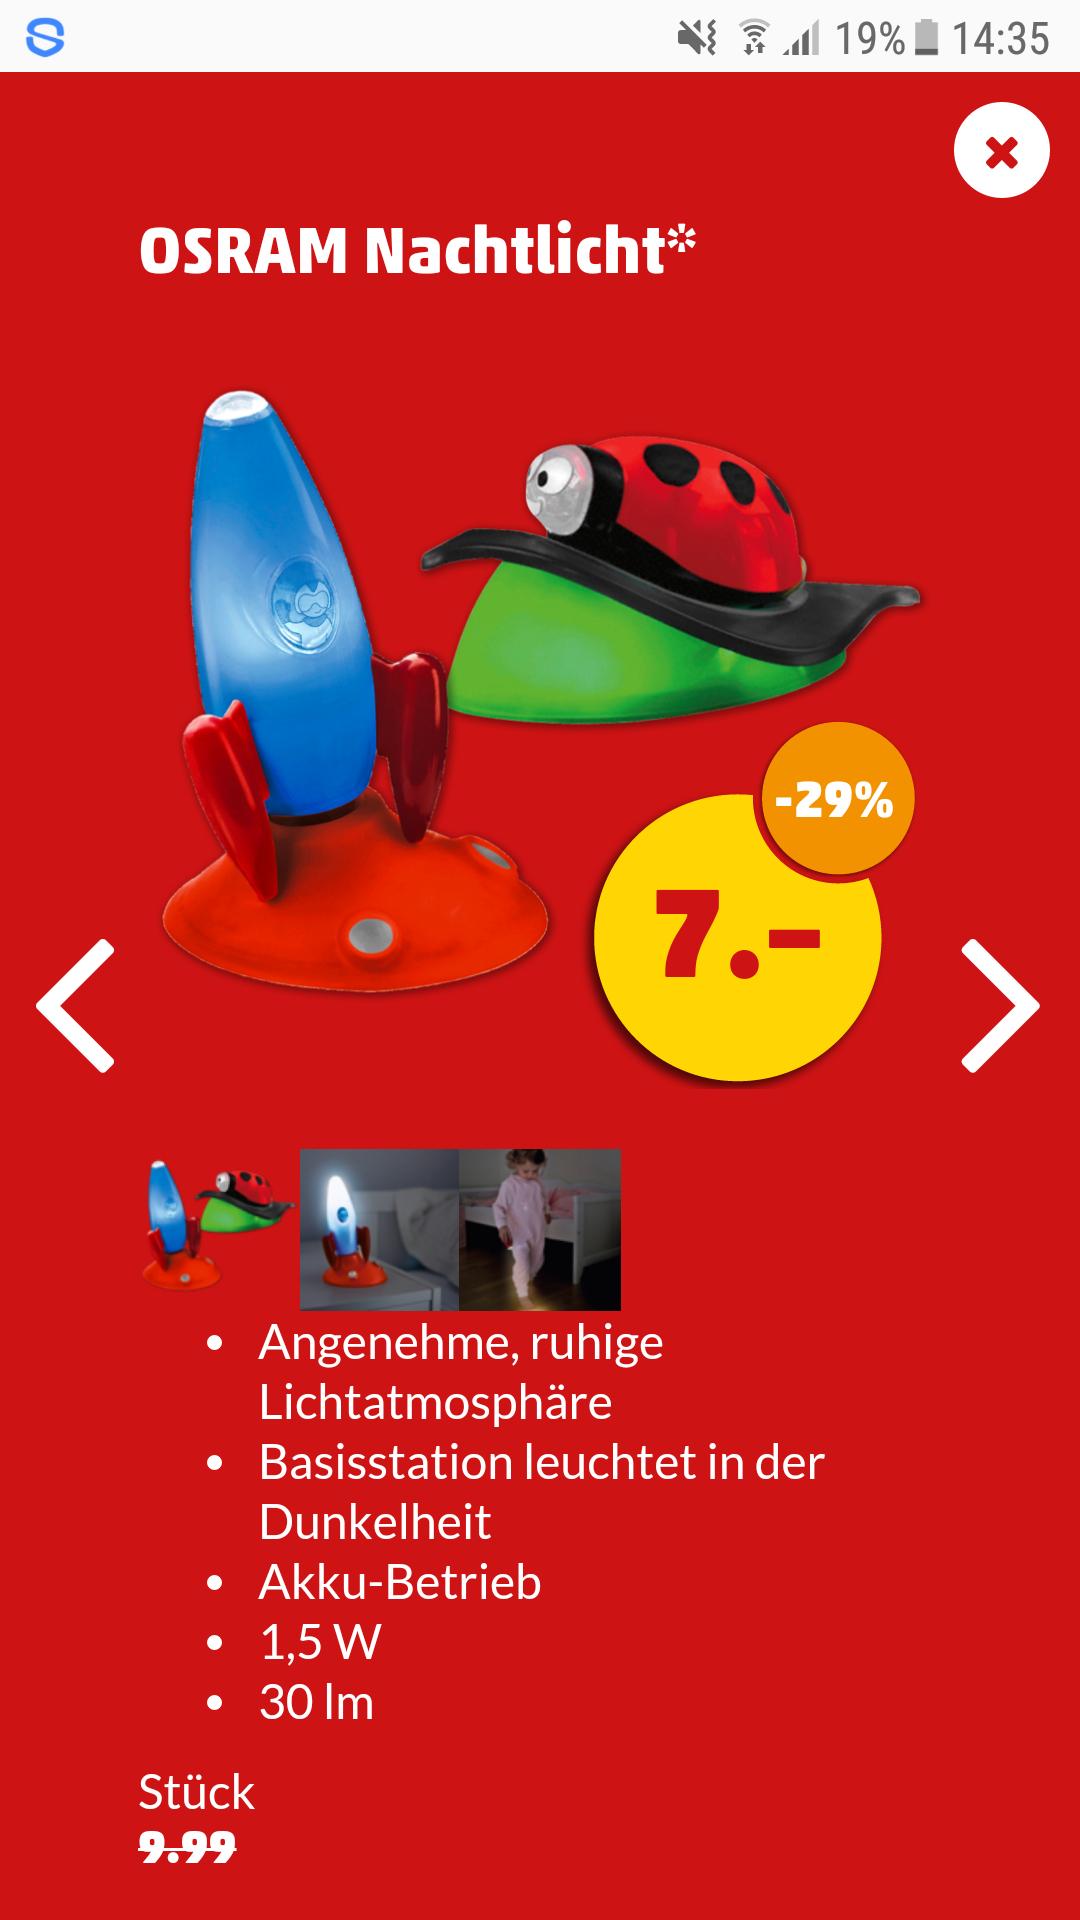 Penny: Osram Nachtlicht Käfer + Rakete